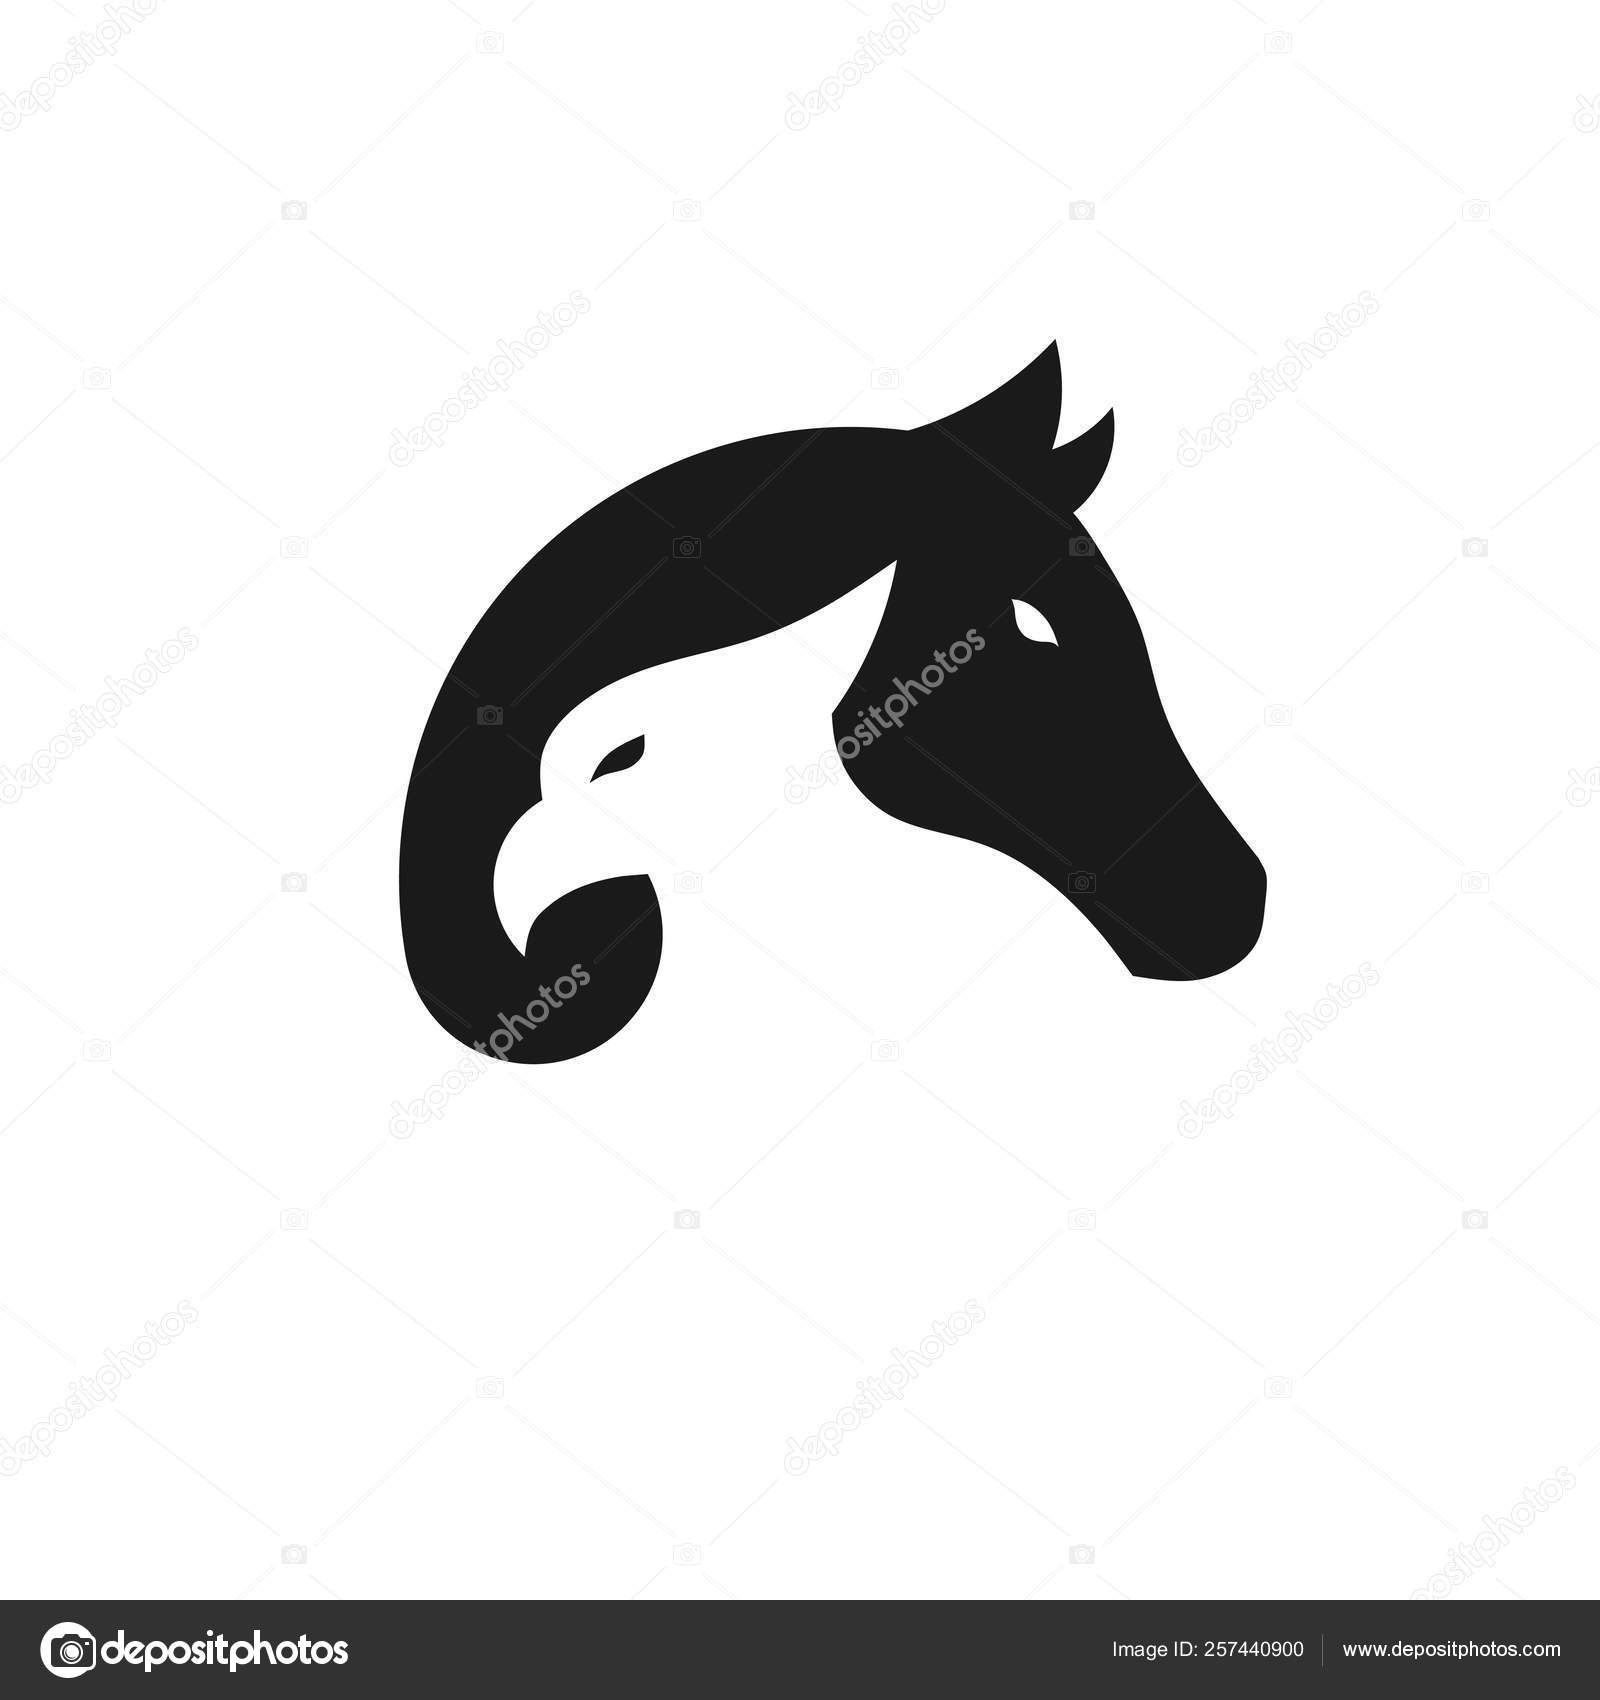 Creative Simple Eagle Horse Logo Vector Concept Stock Vector C Krustovin 257440900